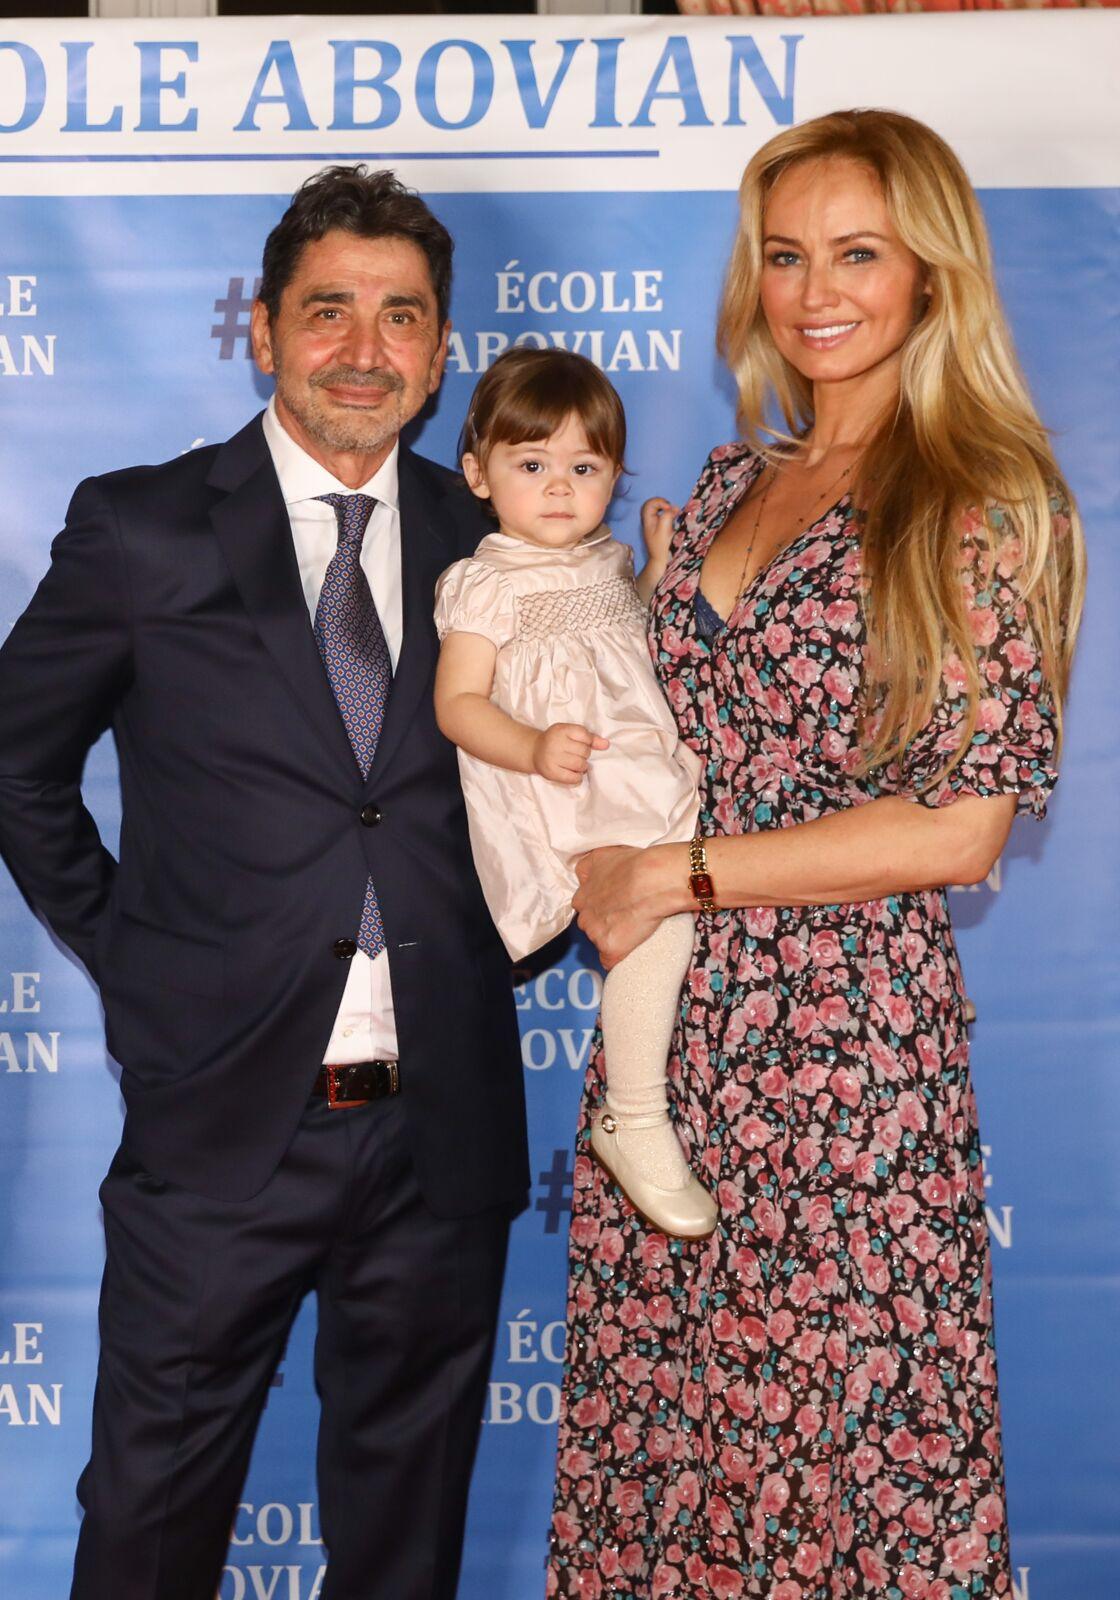 Adriana Karembeu, son mari Aram Ohanian et leur fille Nina réunis lors d'une soirée caritative organisée à Marseille, le 26 octobre 2019.